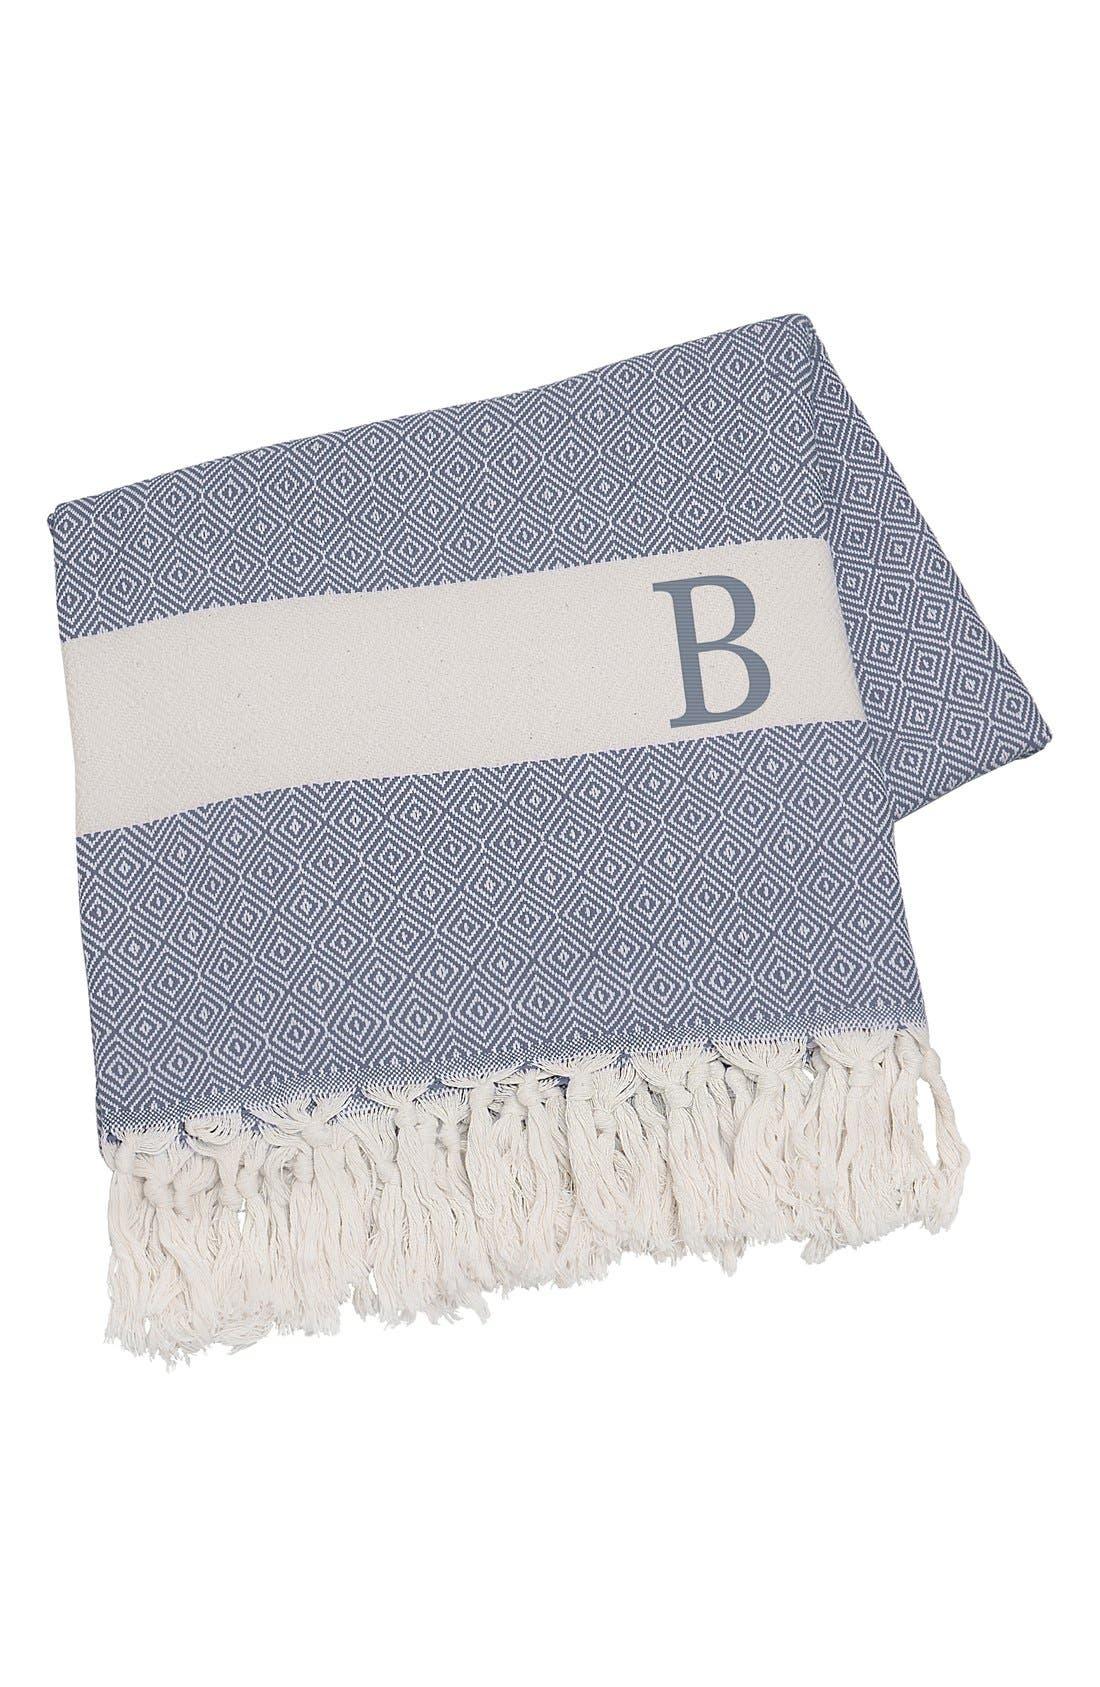 Monogram Turkish Cotton Throw,                         Main,                         color, Blue - B